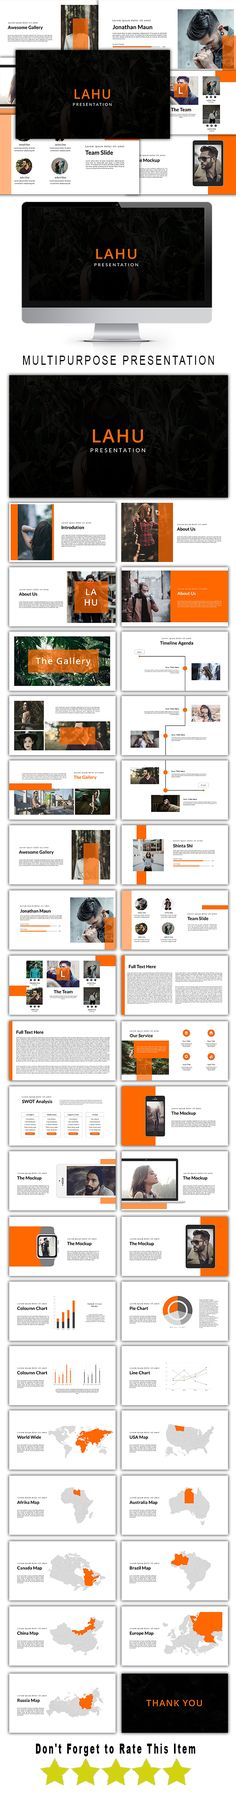 Lahu Multipurpose Google Slide Template - #Google Slides #Presentation #Templates Download here:  https://graphicriver.net/item/lahu-multipurpose-google-slide-template/20328513?ref=alena994